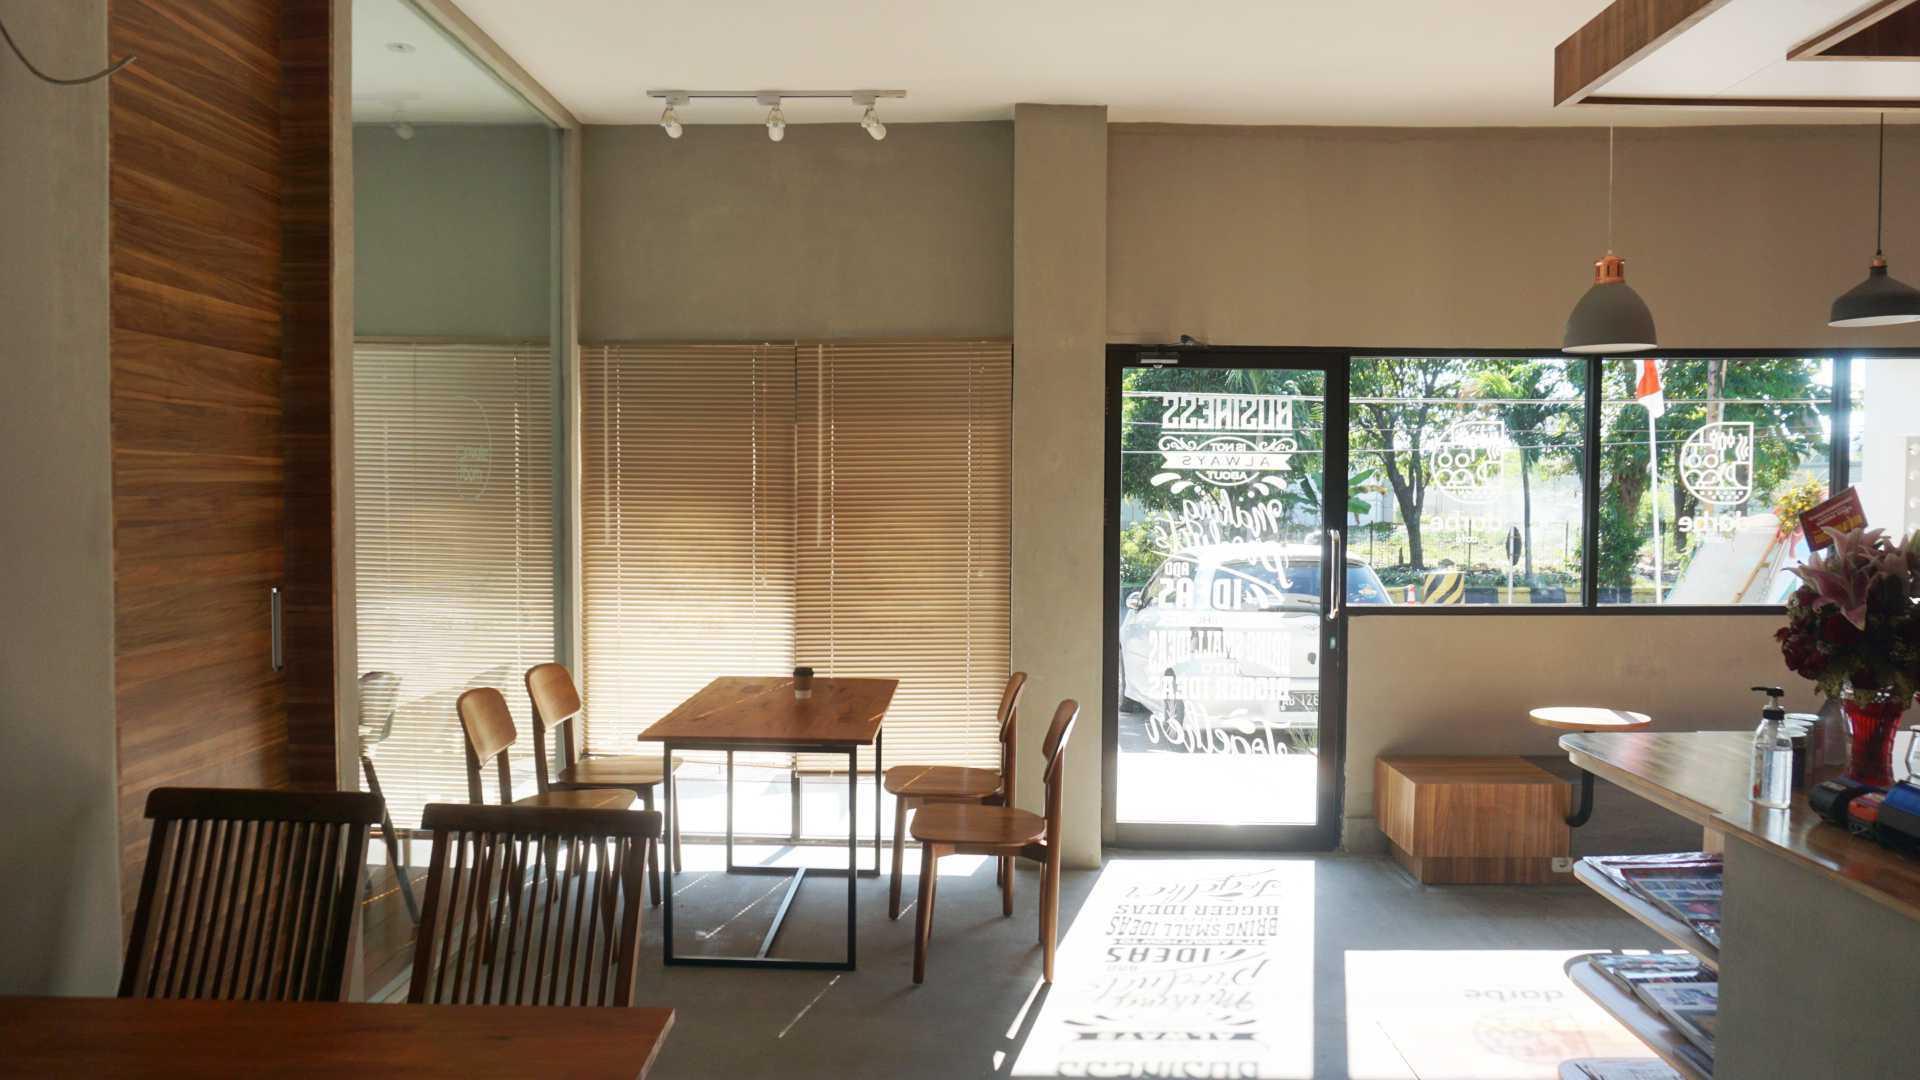 Sekala Darbe Cafe & Office, Surabaya Surabaya, Kota Sby, Jawa Timur, Indonesia Surabaya, Kota Sby, Jawa Timur, Indonesia Sekala-Drabe-Cafe-Office  97786